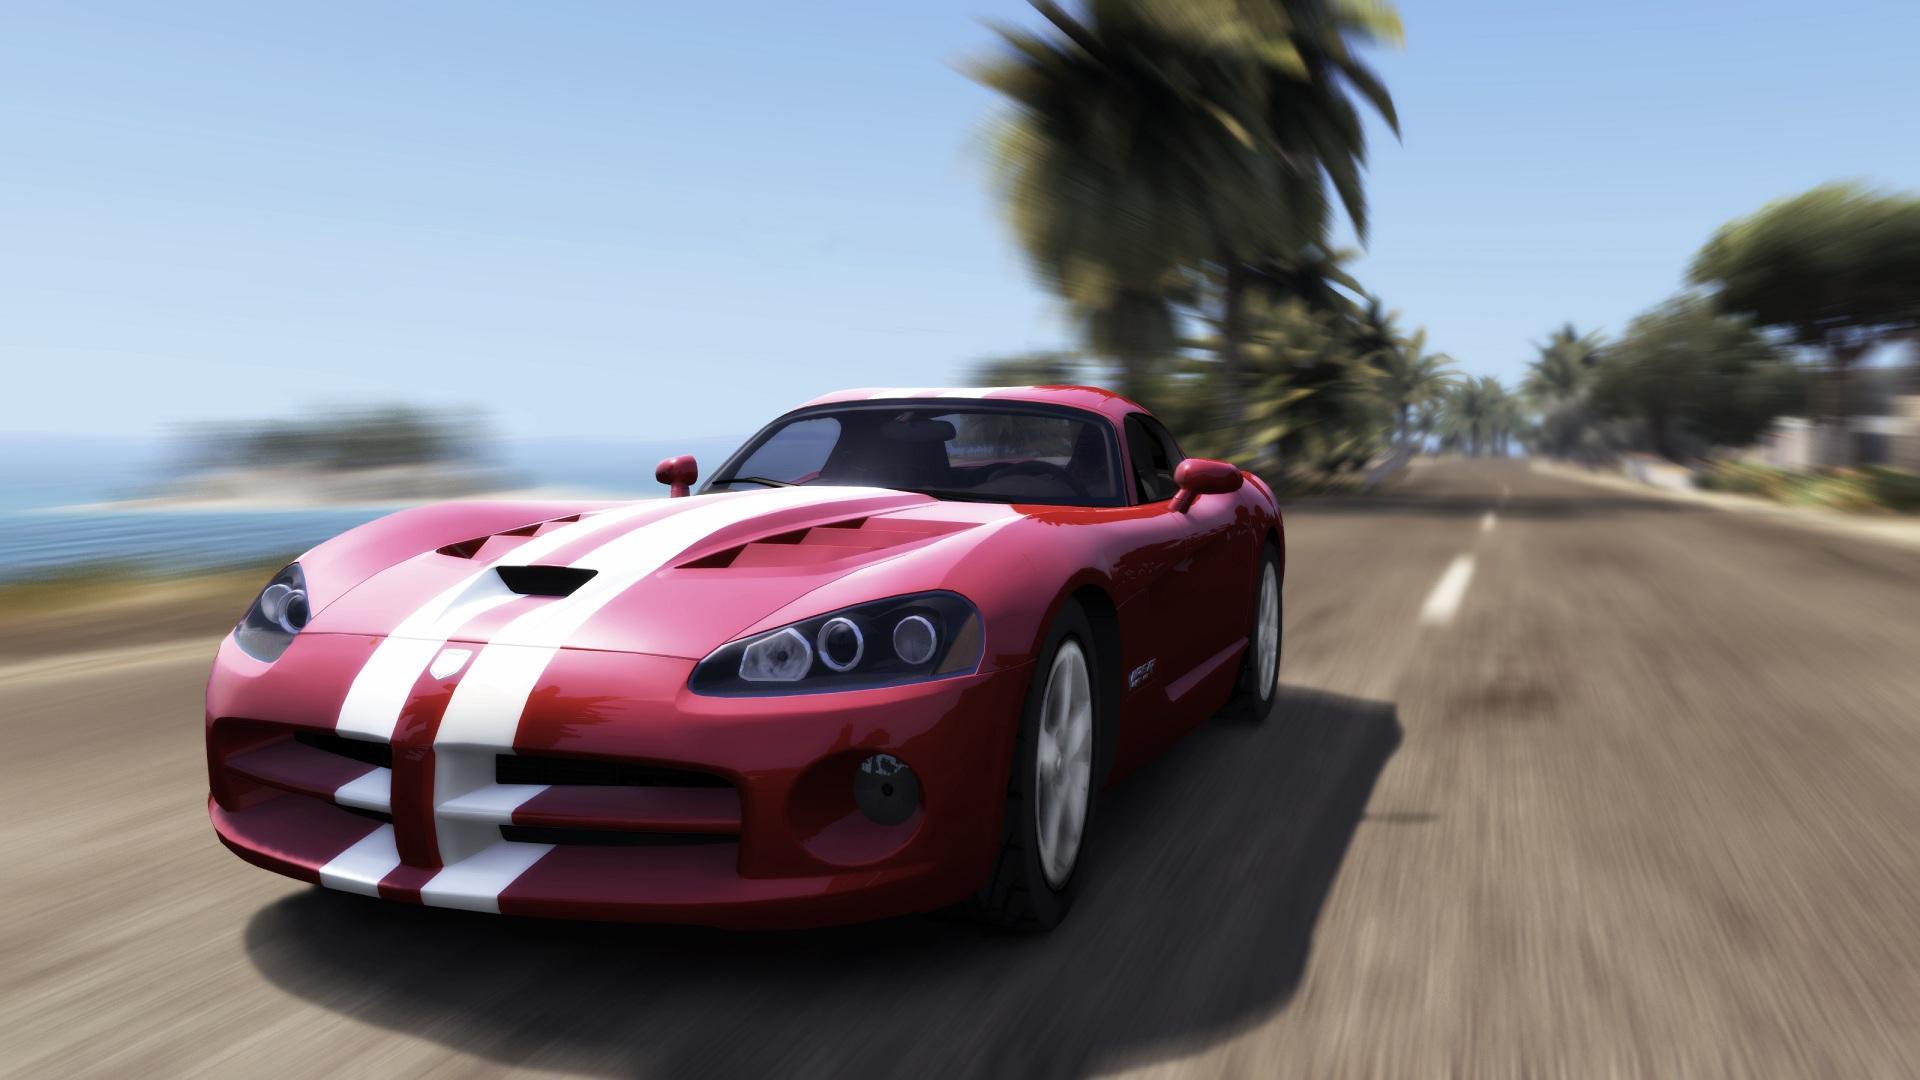 Casino Test Drive Unlimited 2 Offline